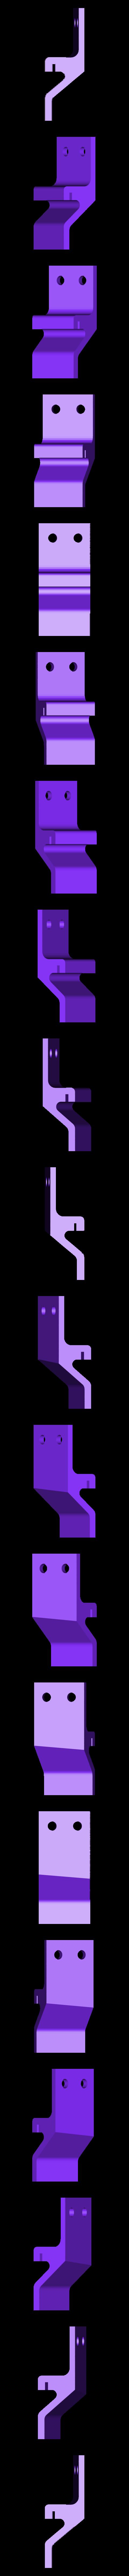 Tope de ventana 2.stl Download STL file Window Stop • 3D printer design, CHS_ht